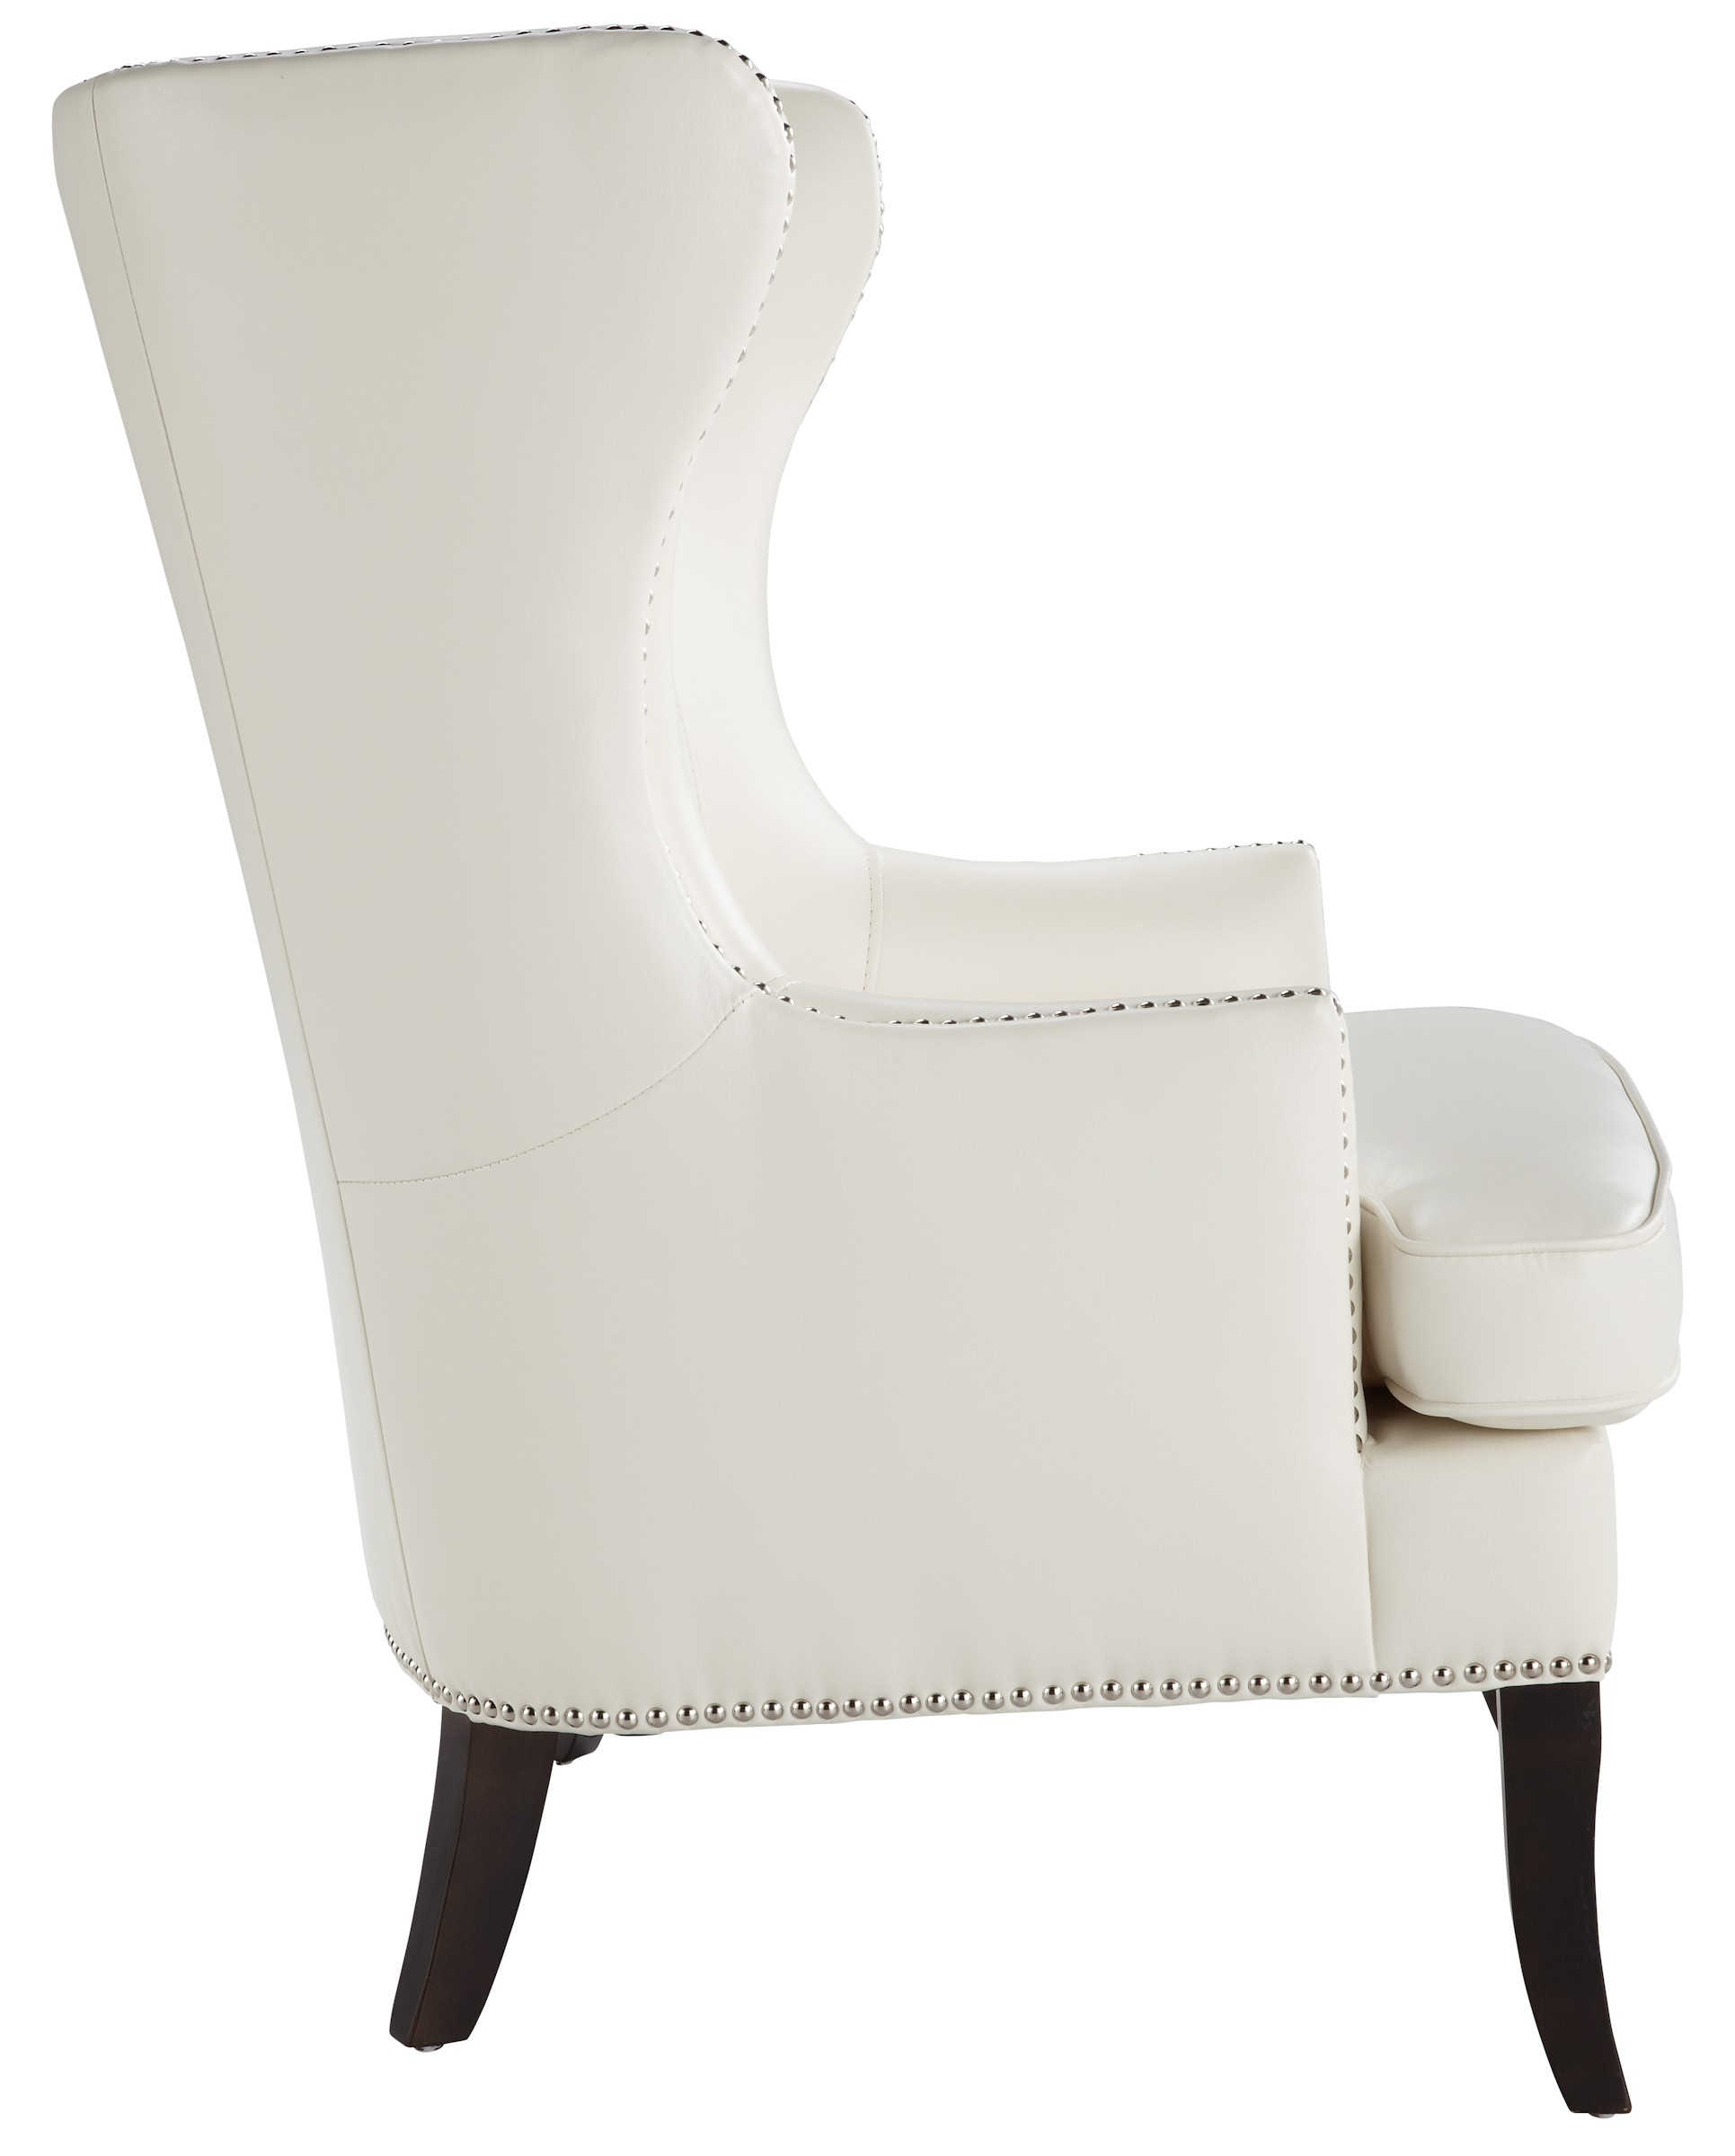 ivory leather office chair bassett ellis executive royalton arm from sunpan 31046 coleman